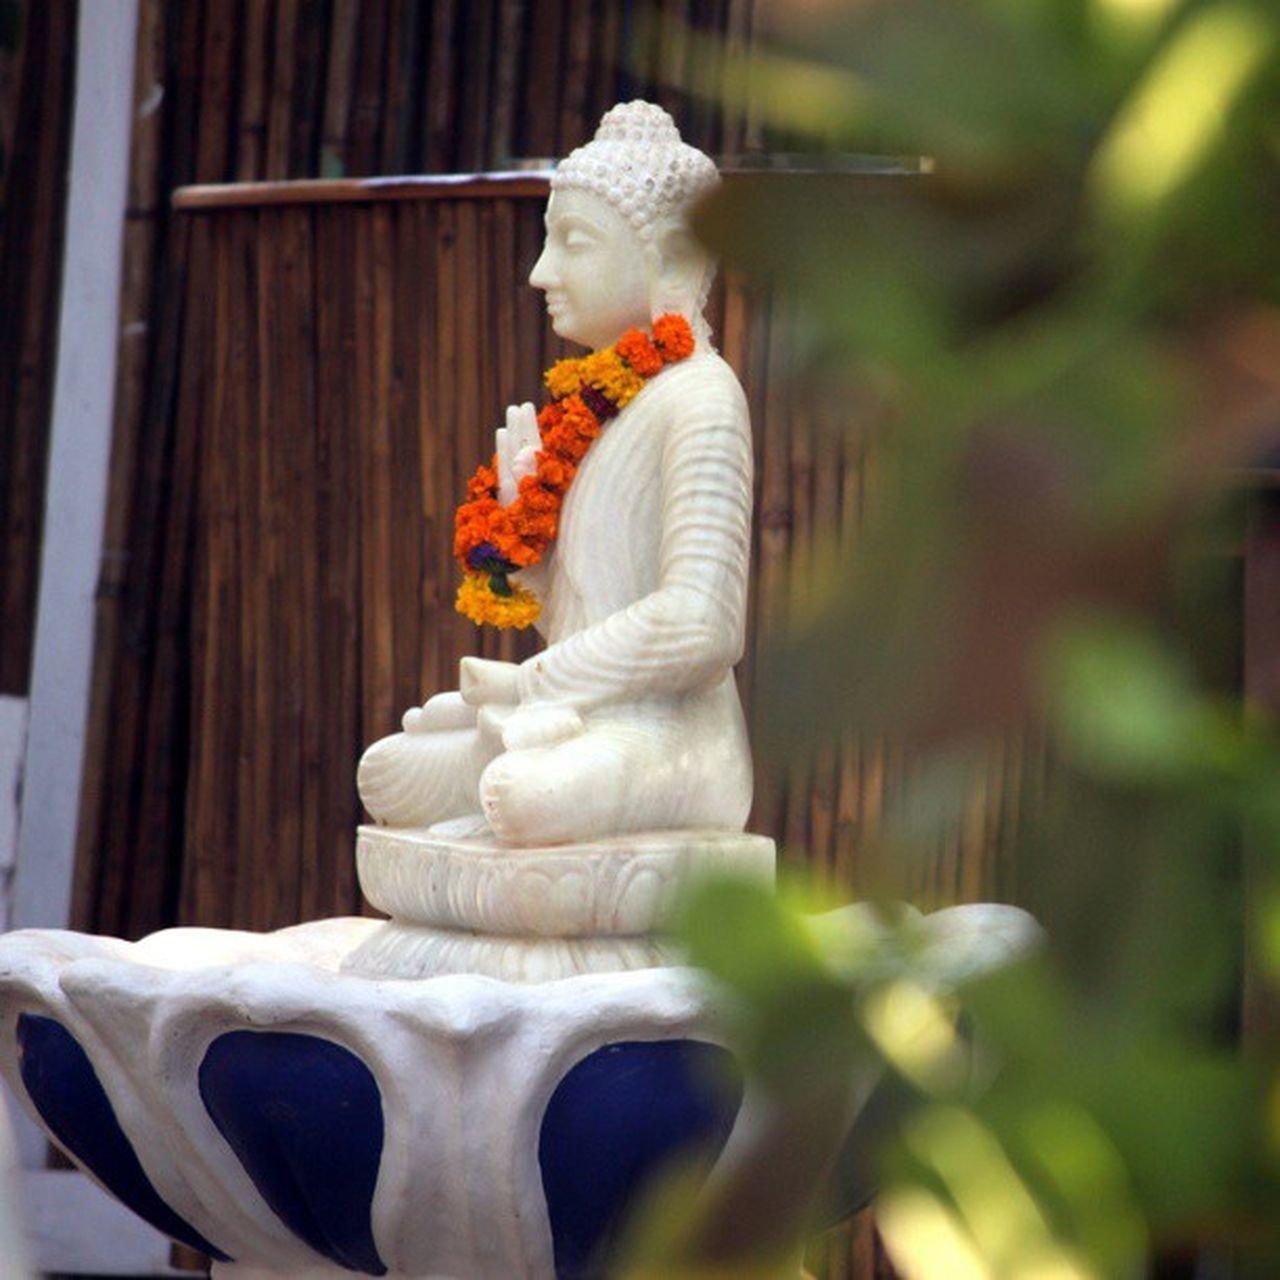 Calm Buddha Statue Art Ashvem Goa @goa